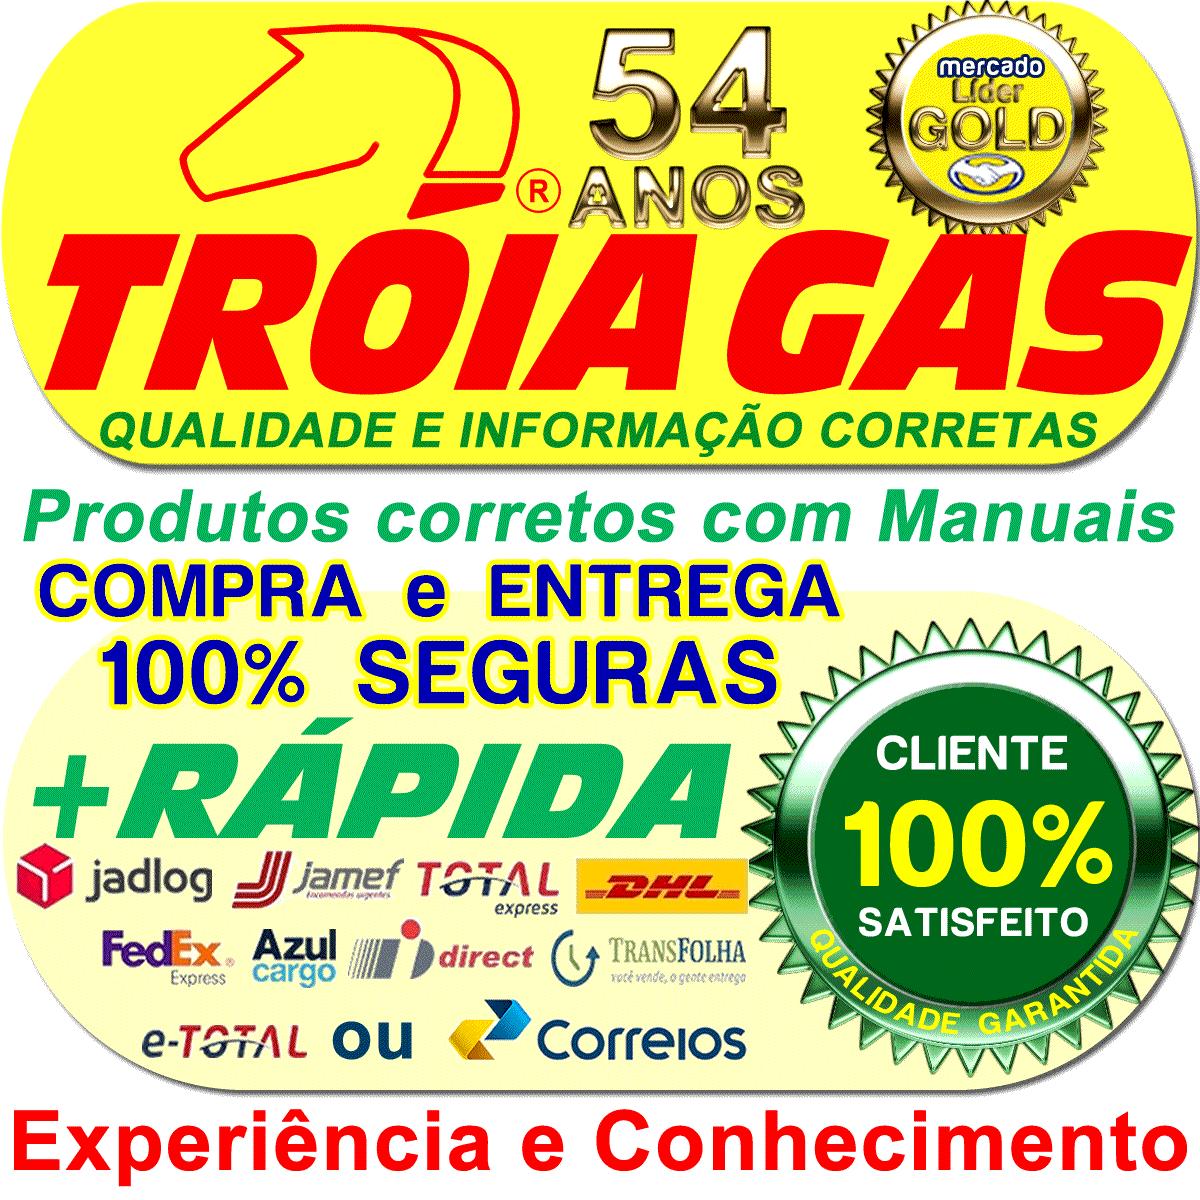 Manômetro T800 para comutadoras TURY GAS T1000 T1011 T1015 T1200 T3000